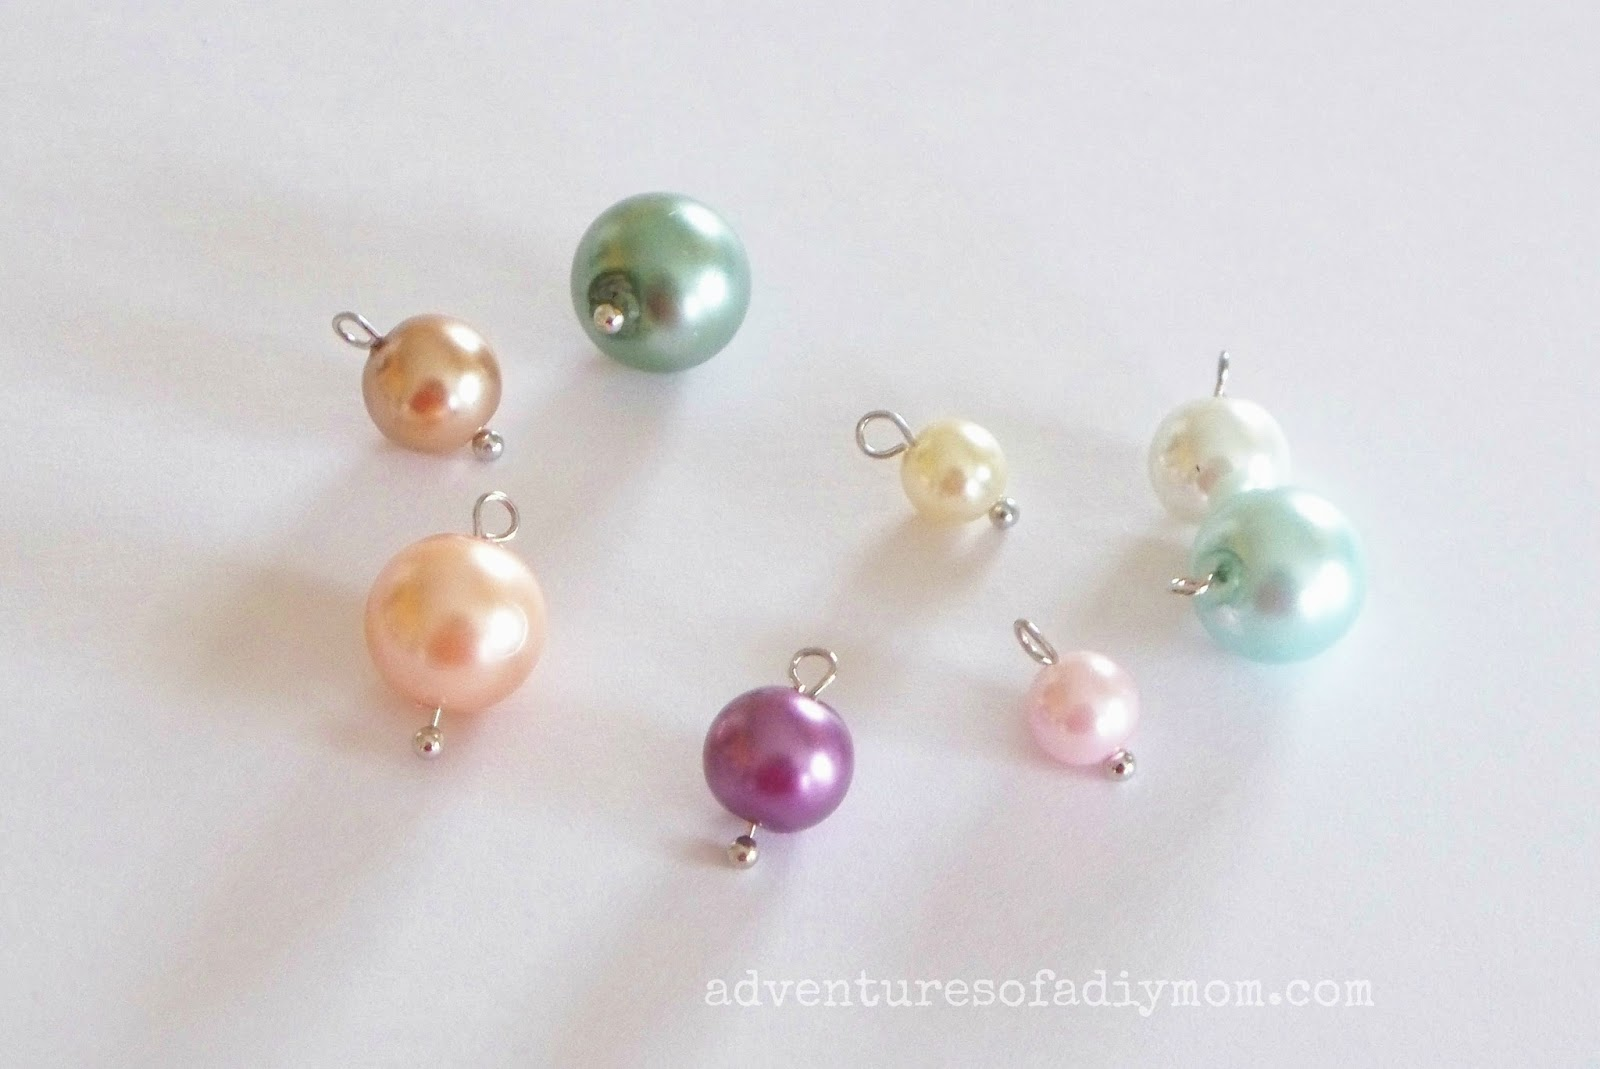 DIY Pearl Cluster Necklace Tutorial